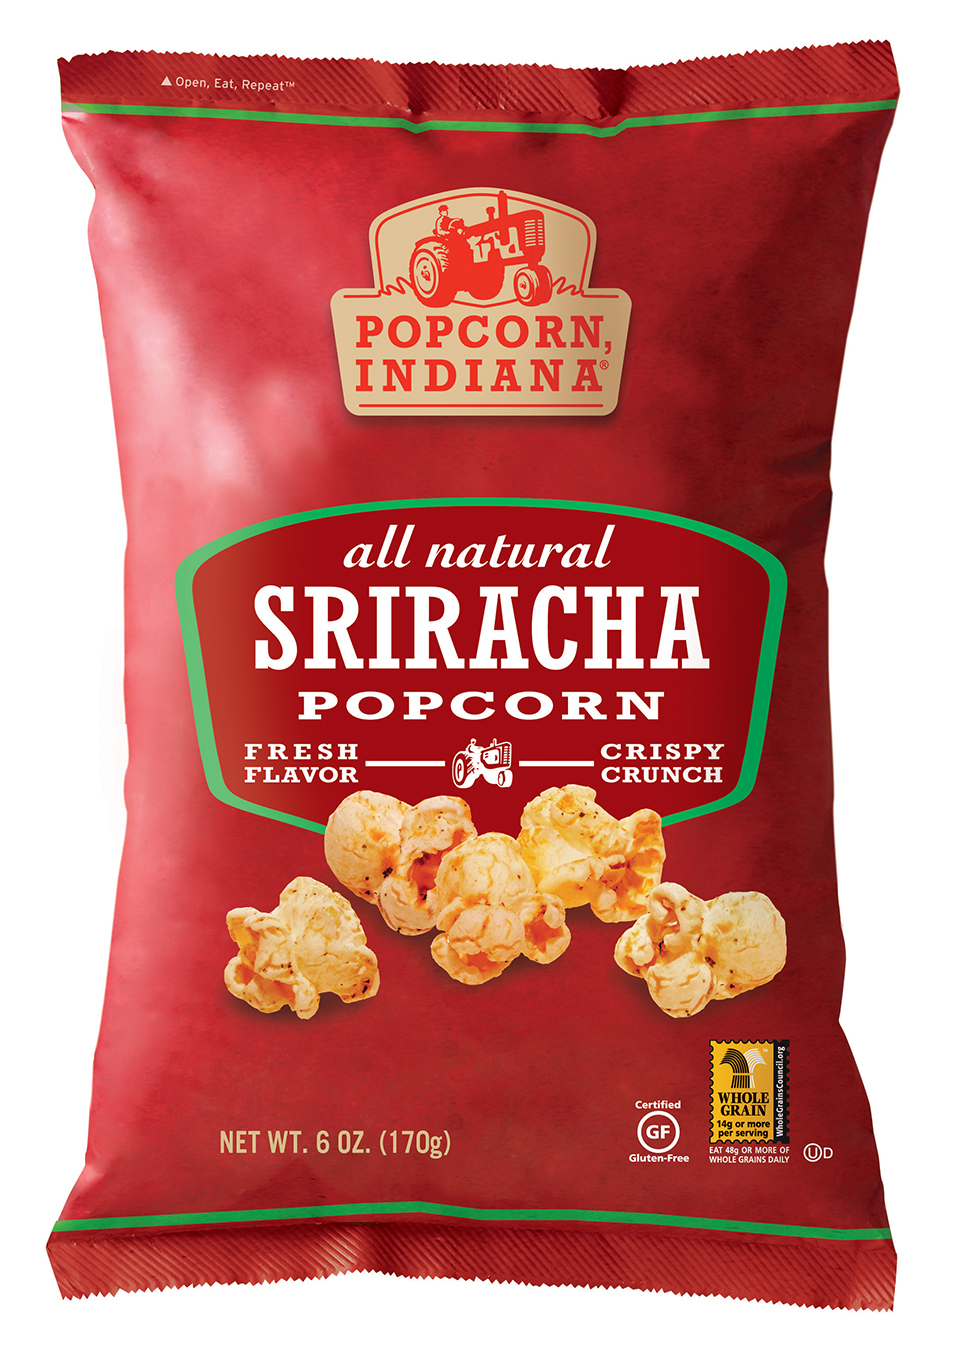 Popcorn Indiana Sriracha Popcorn